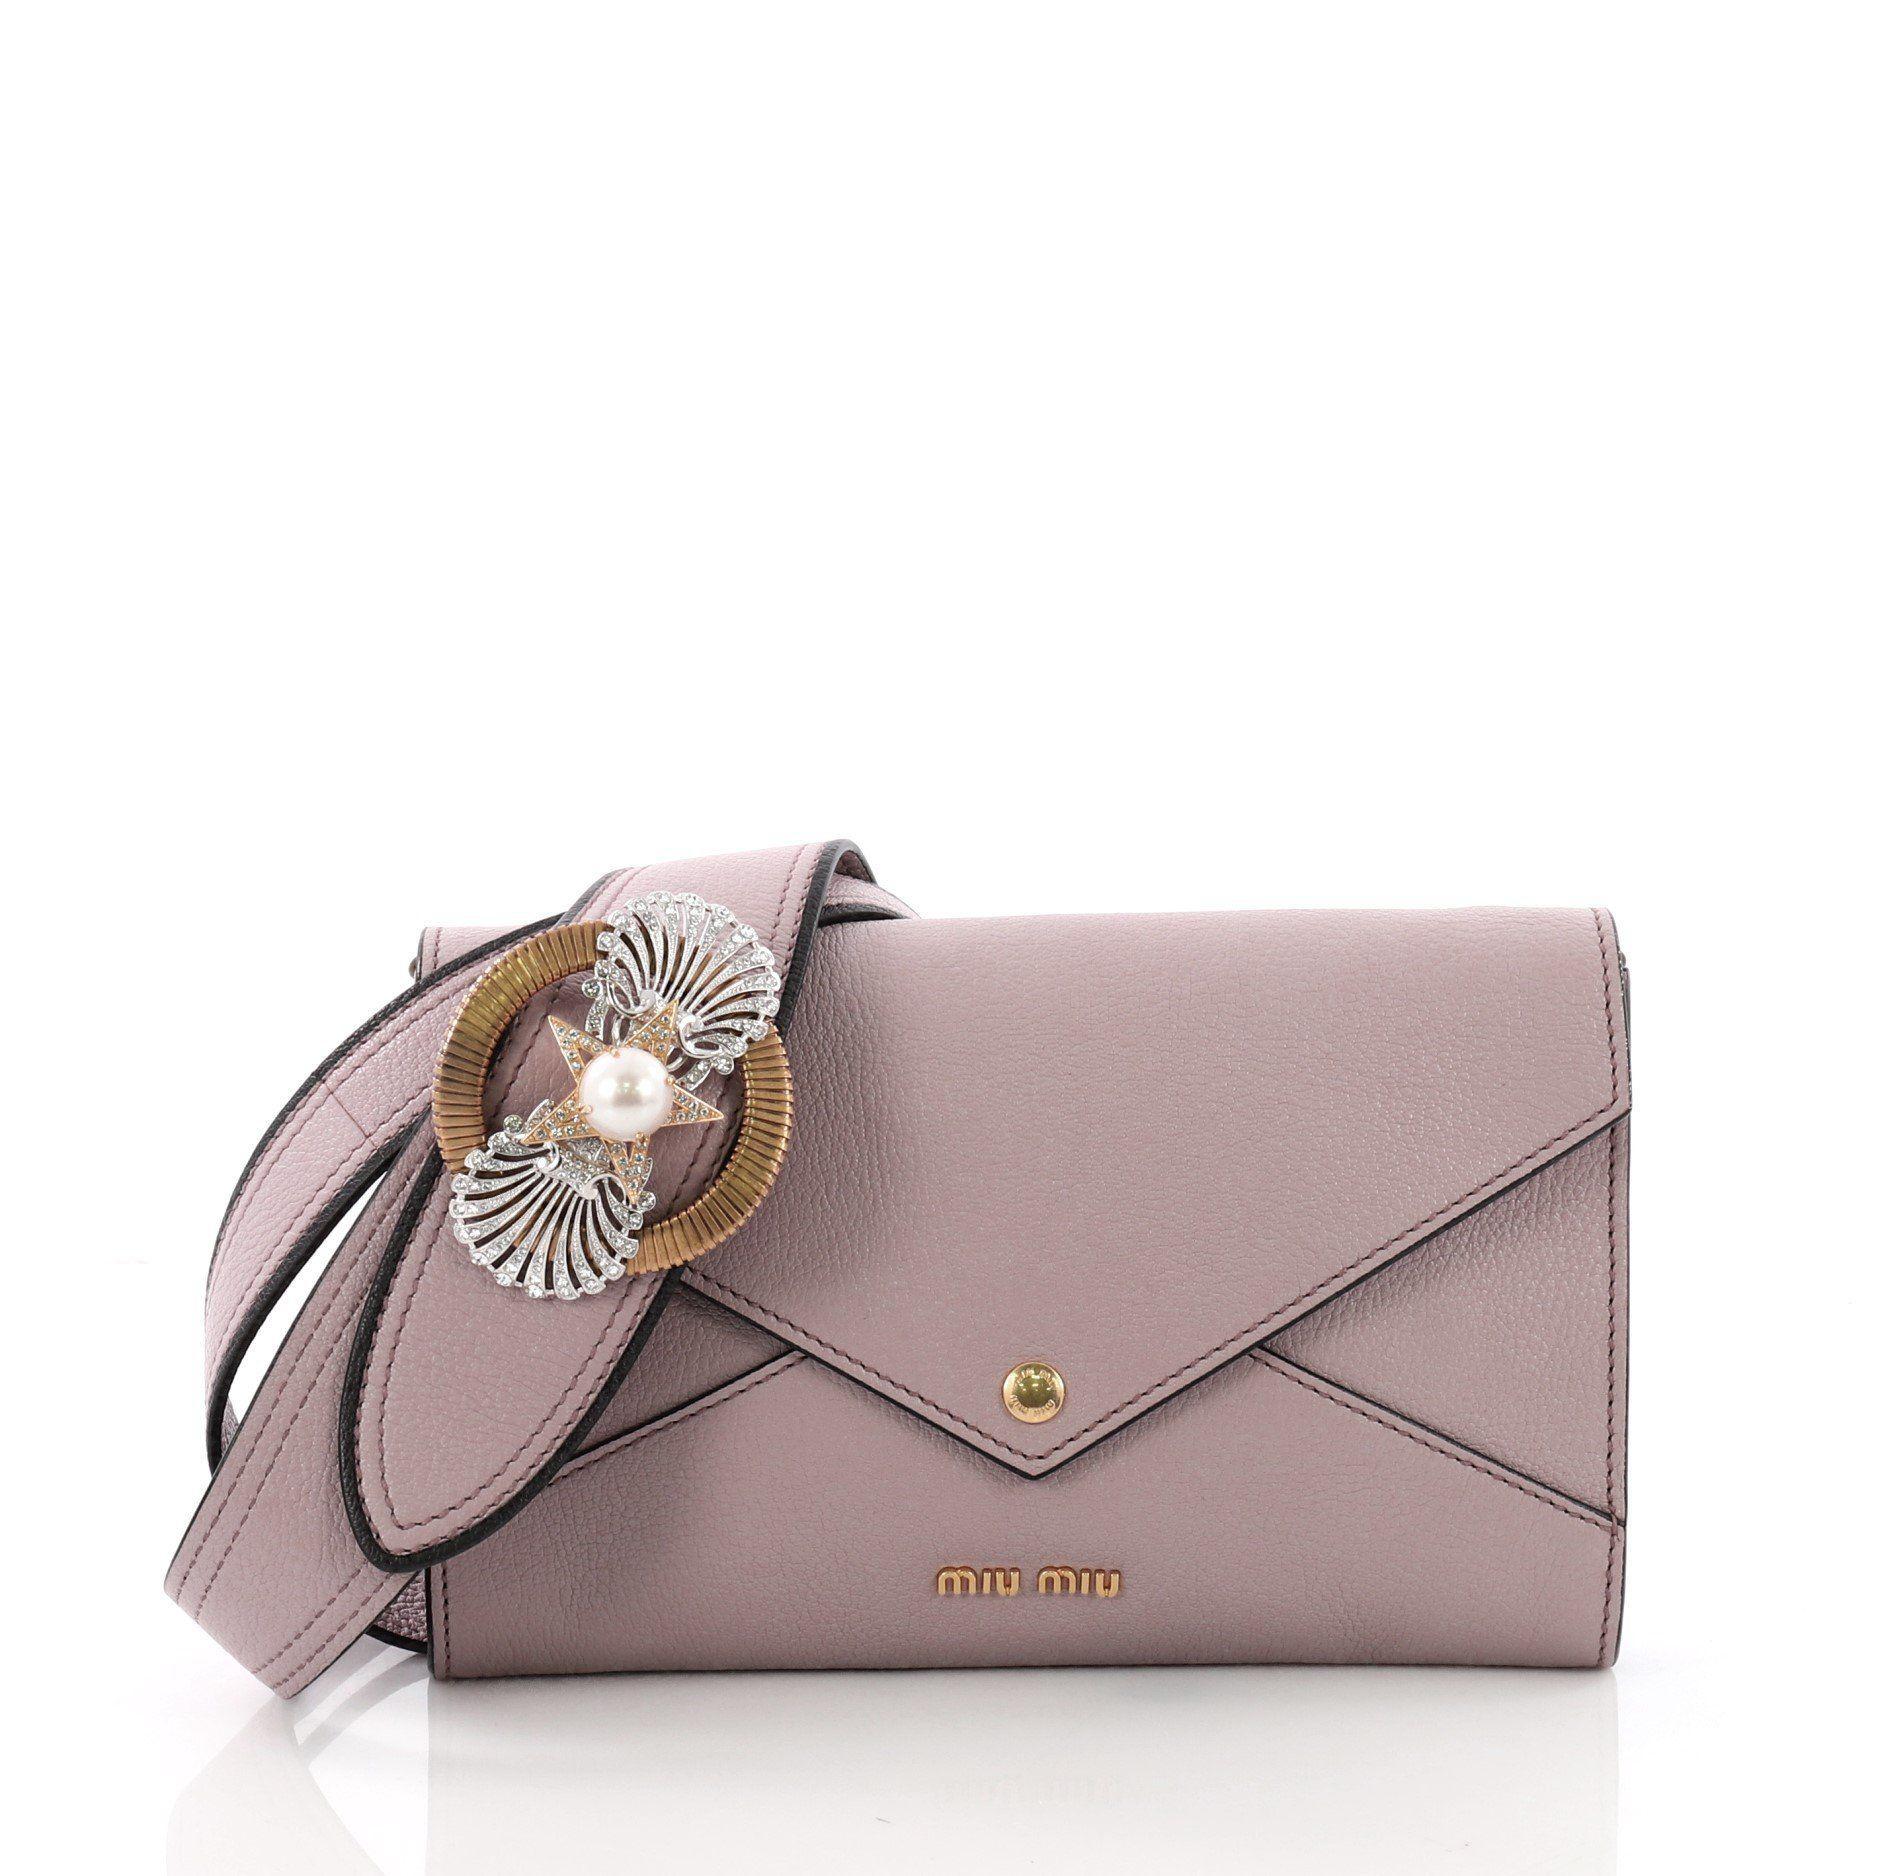 Miu Miu. Women s Pre Owned Madras Envelope Shoulder Bag Leather 62c5845561d32